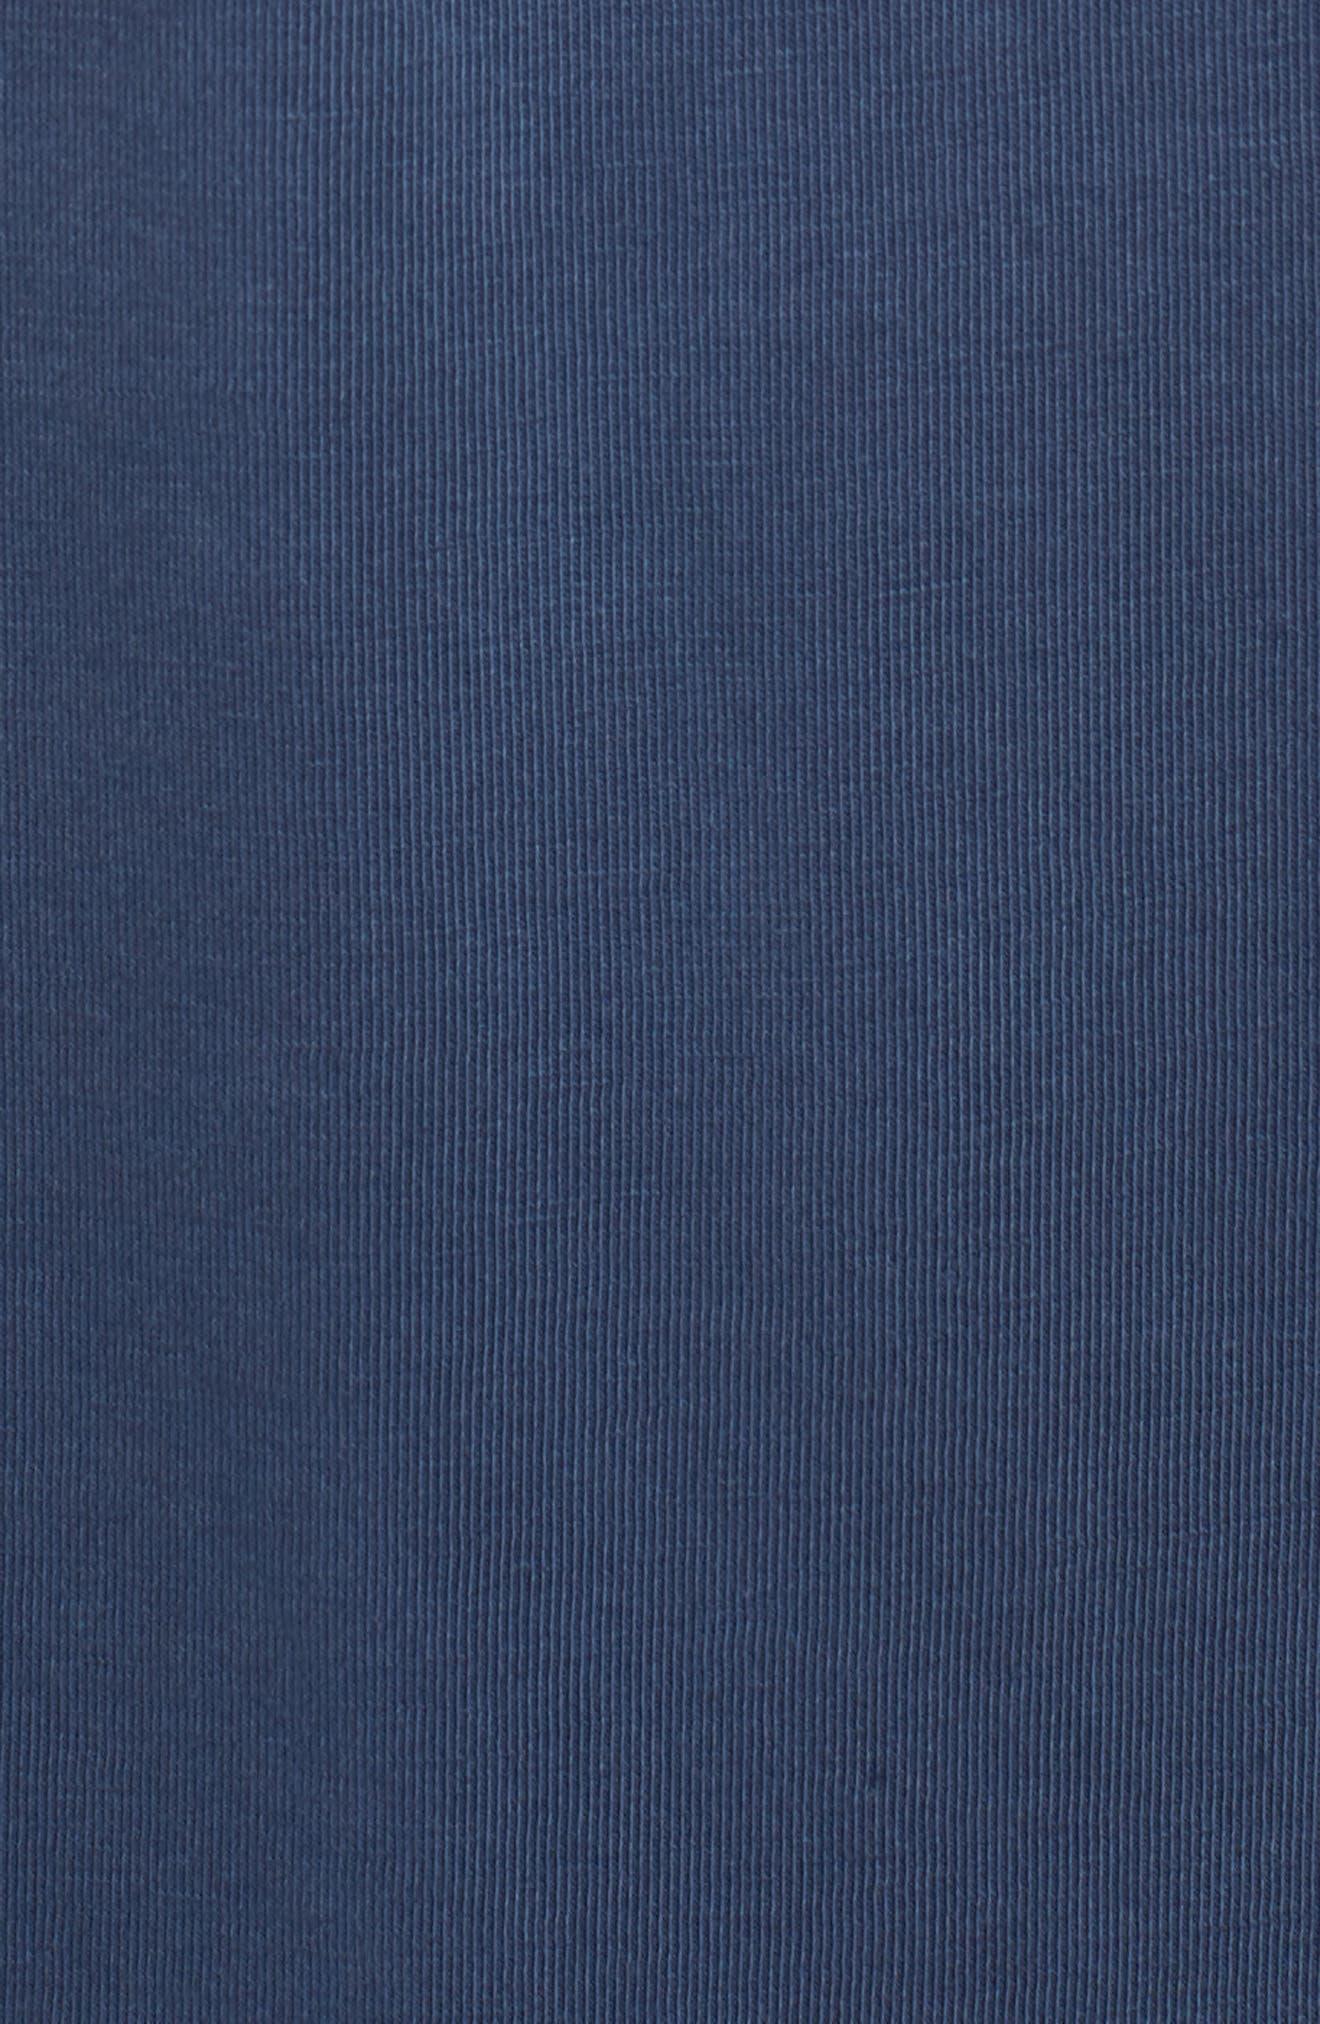 Anders Slim Fit Pocket T-Shirt,                             Alternate thumbnail 41, color,